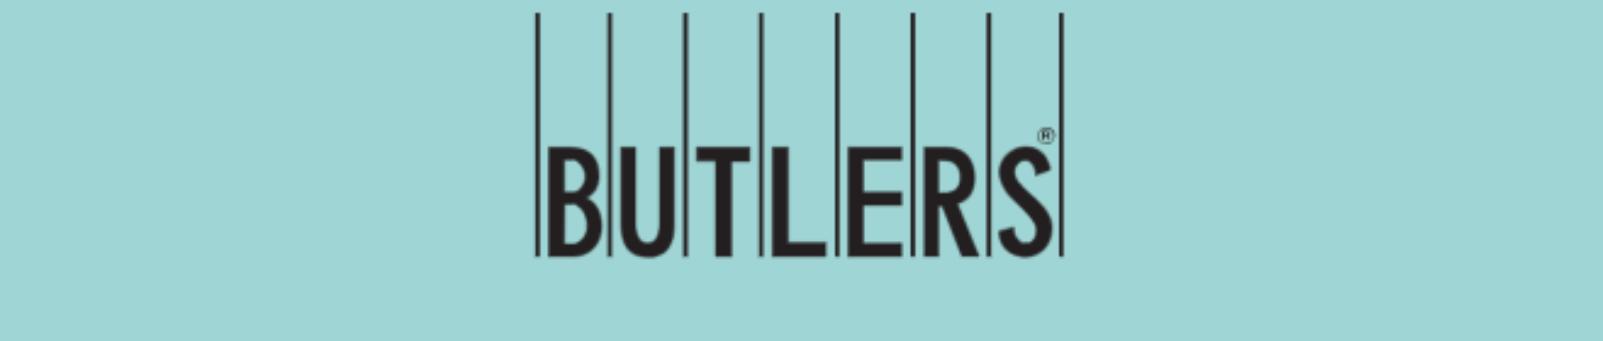 Butlers.Com/Rubbellos